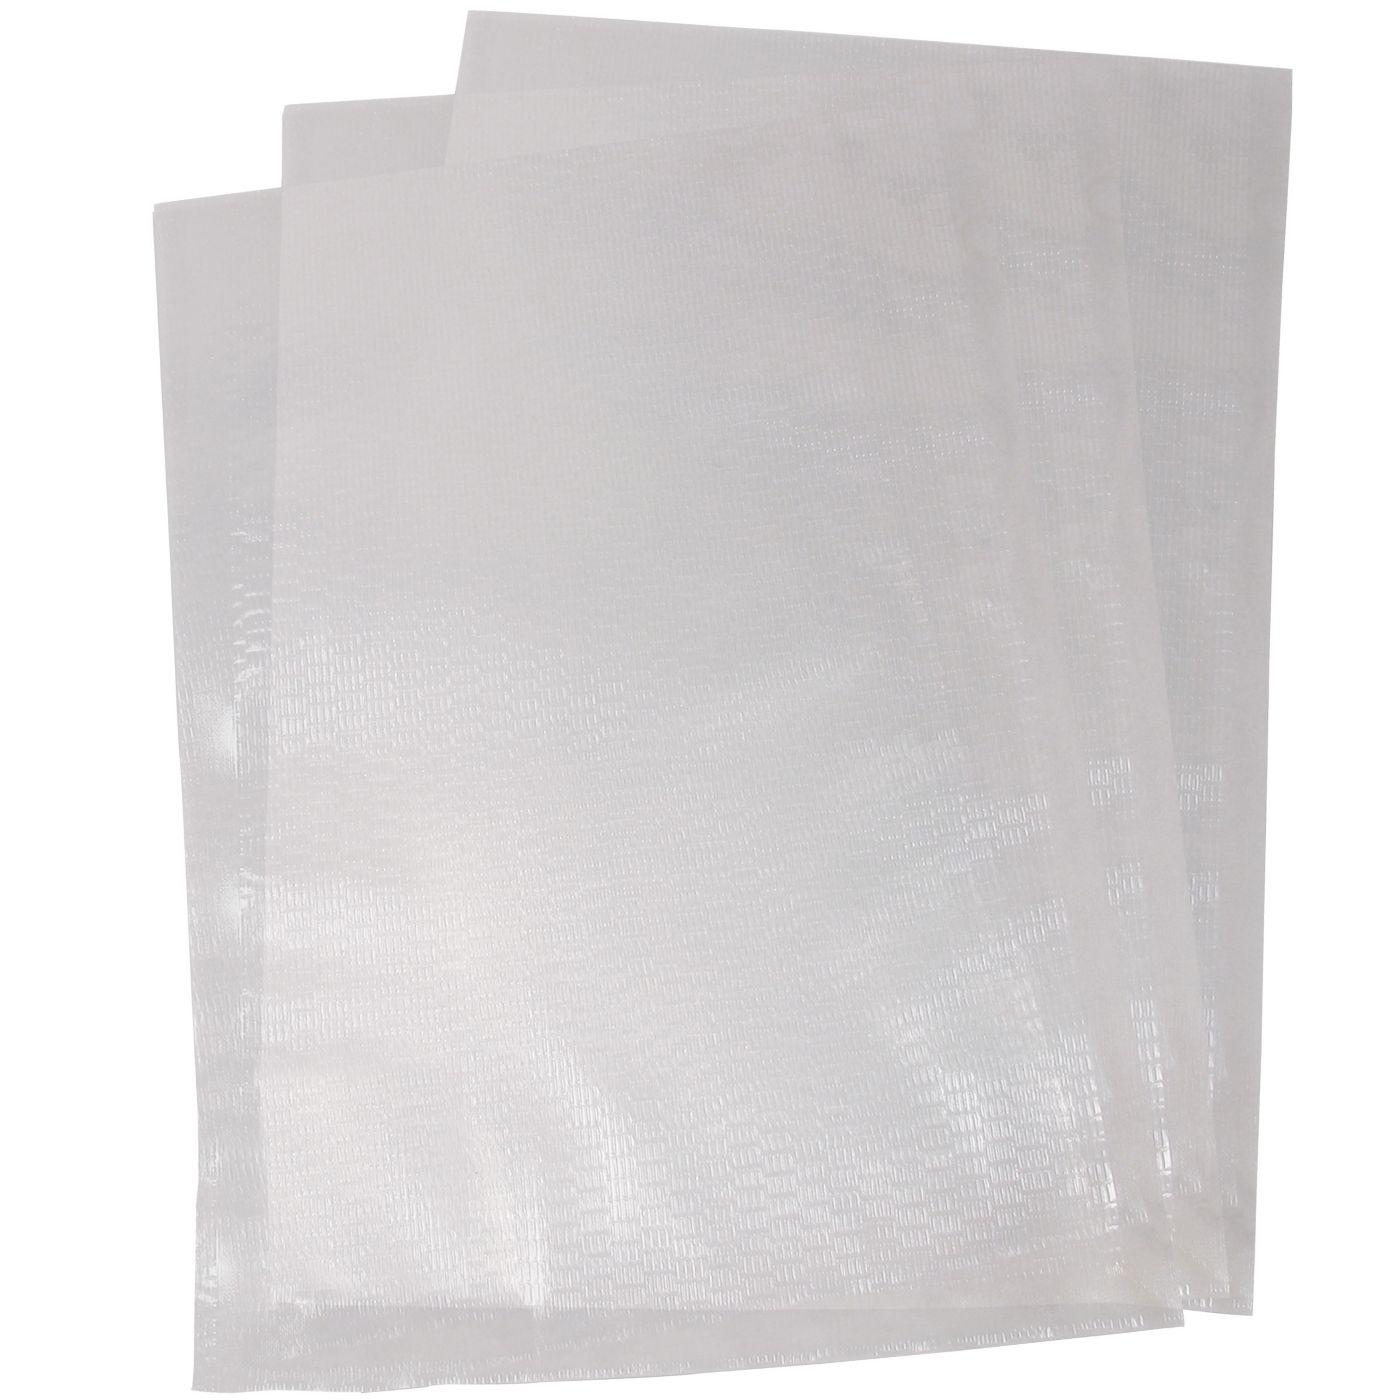 "Weston 6"" x 10"" (Pint) Commercial Grade Vacuum Sealer Bags (100 ct.)"